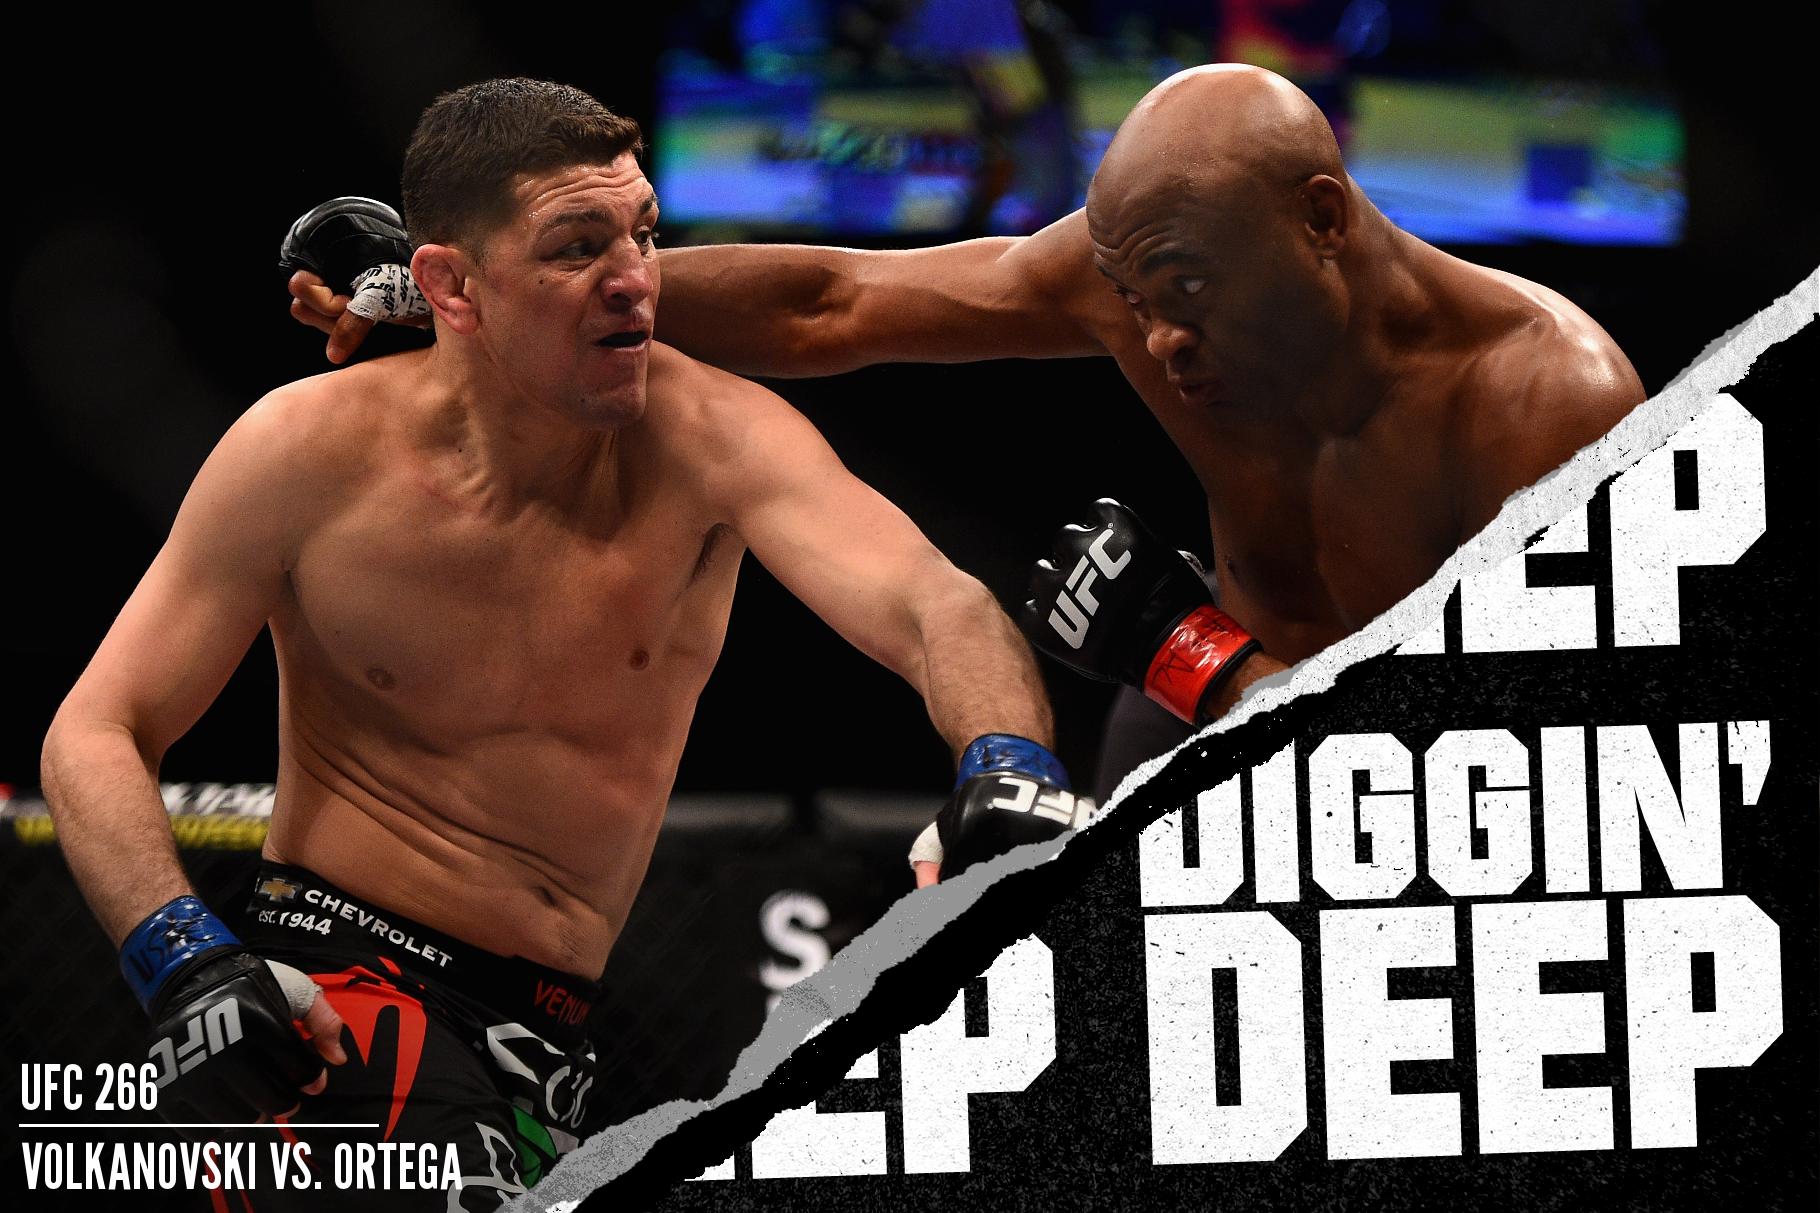 Nick Diaz fighting Anderson Silva at UFC 183